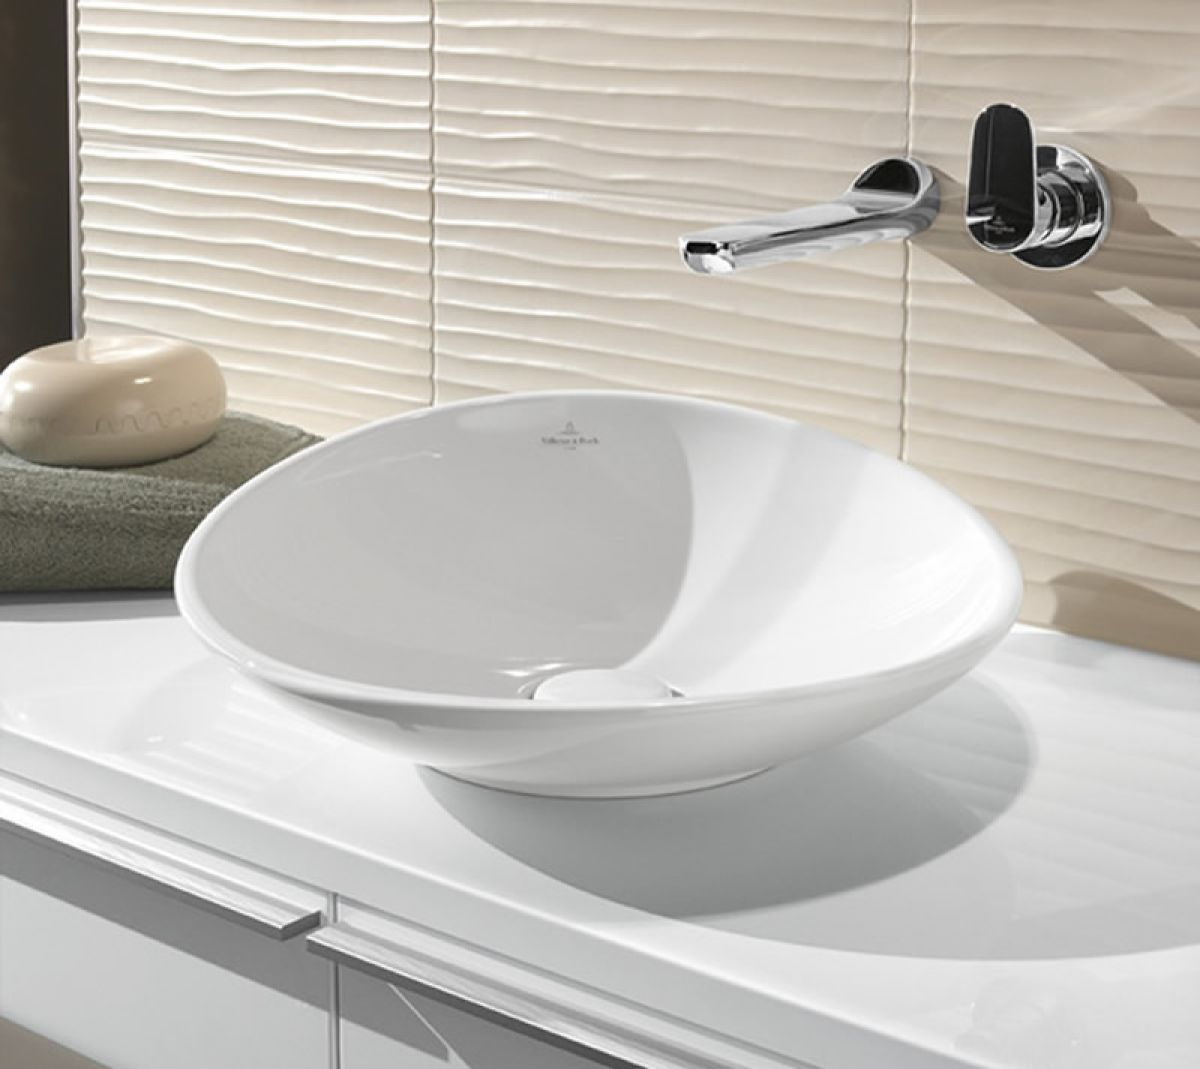 Piastrelle Villeroy Boch.Villeroy Boch My Nature Surface Mounted Basin Bathroom